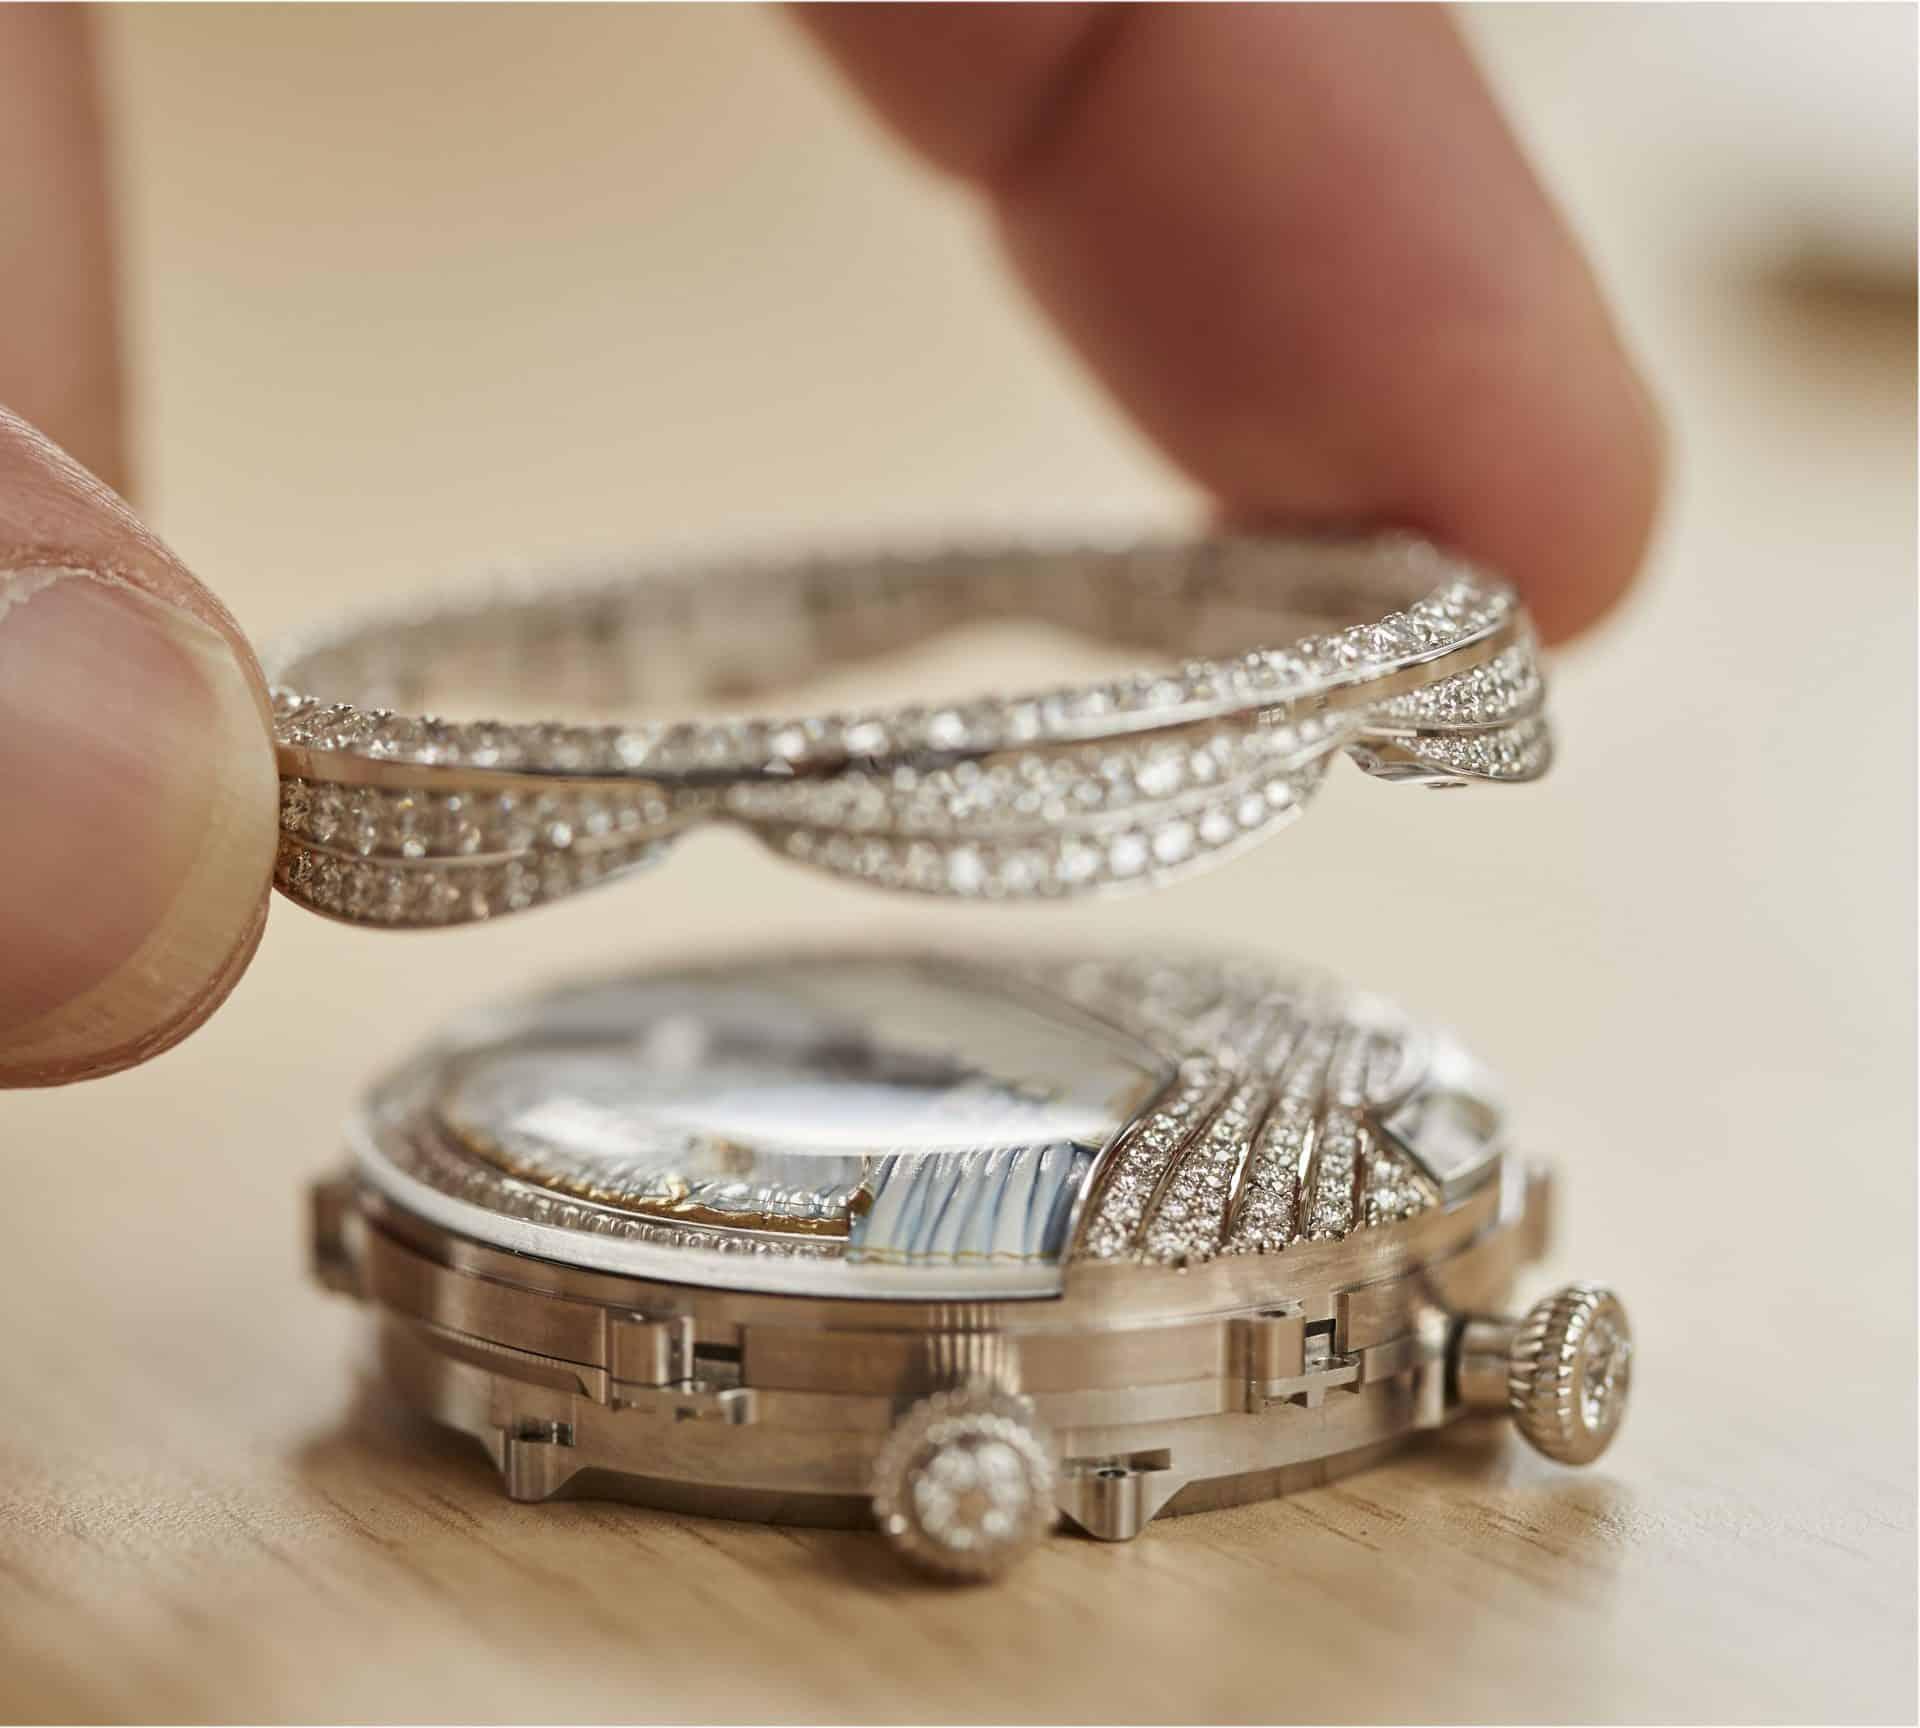 Van Cleef Arpels Lady Arpels Ballerine Musicale Diamant Clement Rousset 2067201 Gehaeusemontage